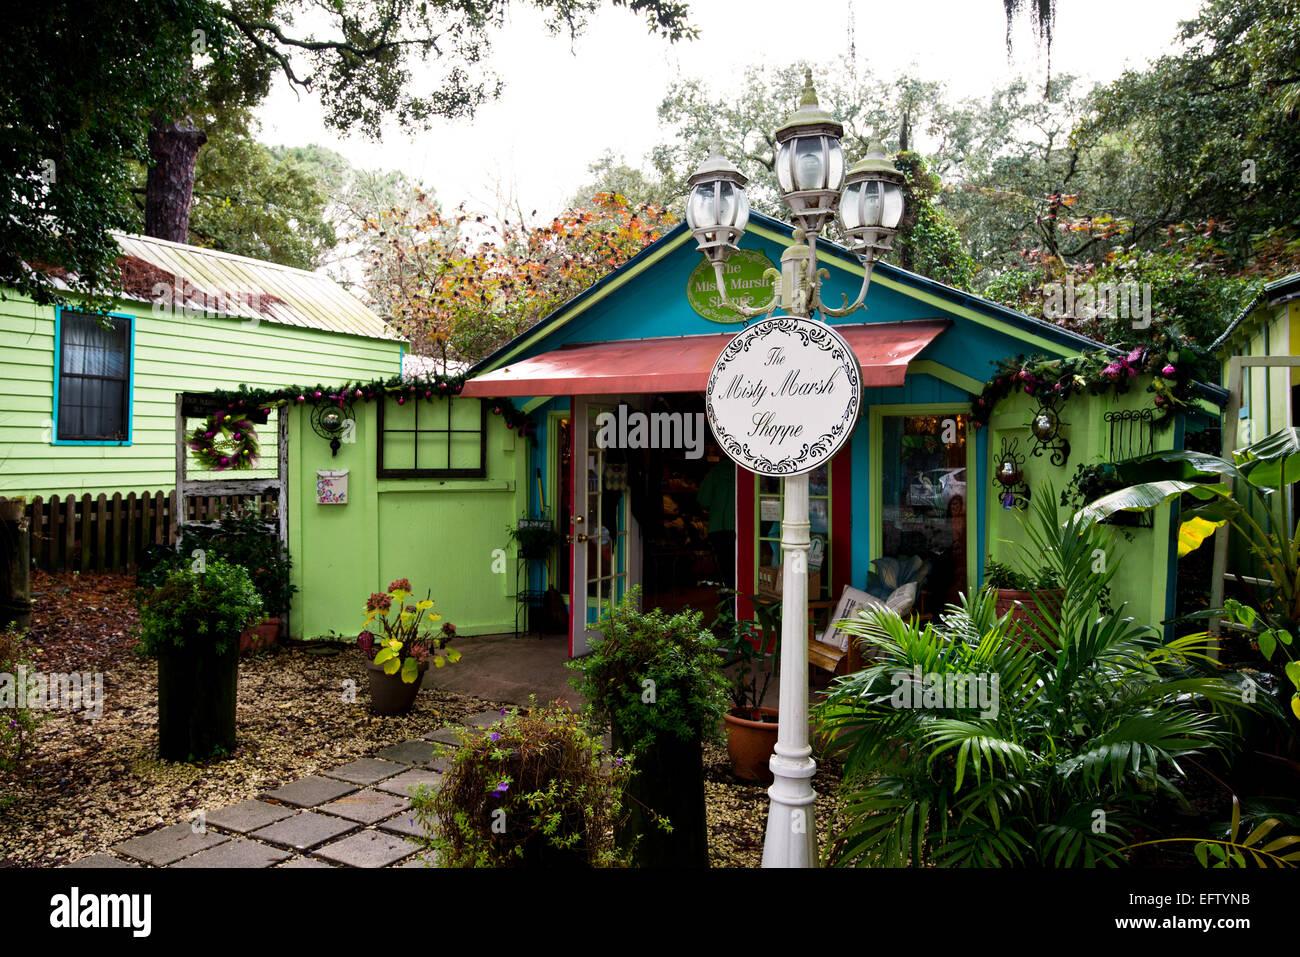 The Misty Marsh Shoppe a quaint touristy gift shop in Tybee Island Georgia - Stock Image